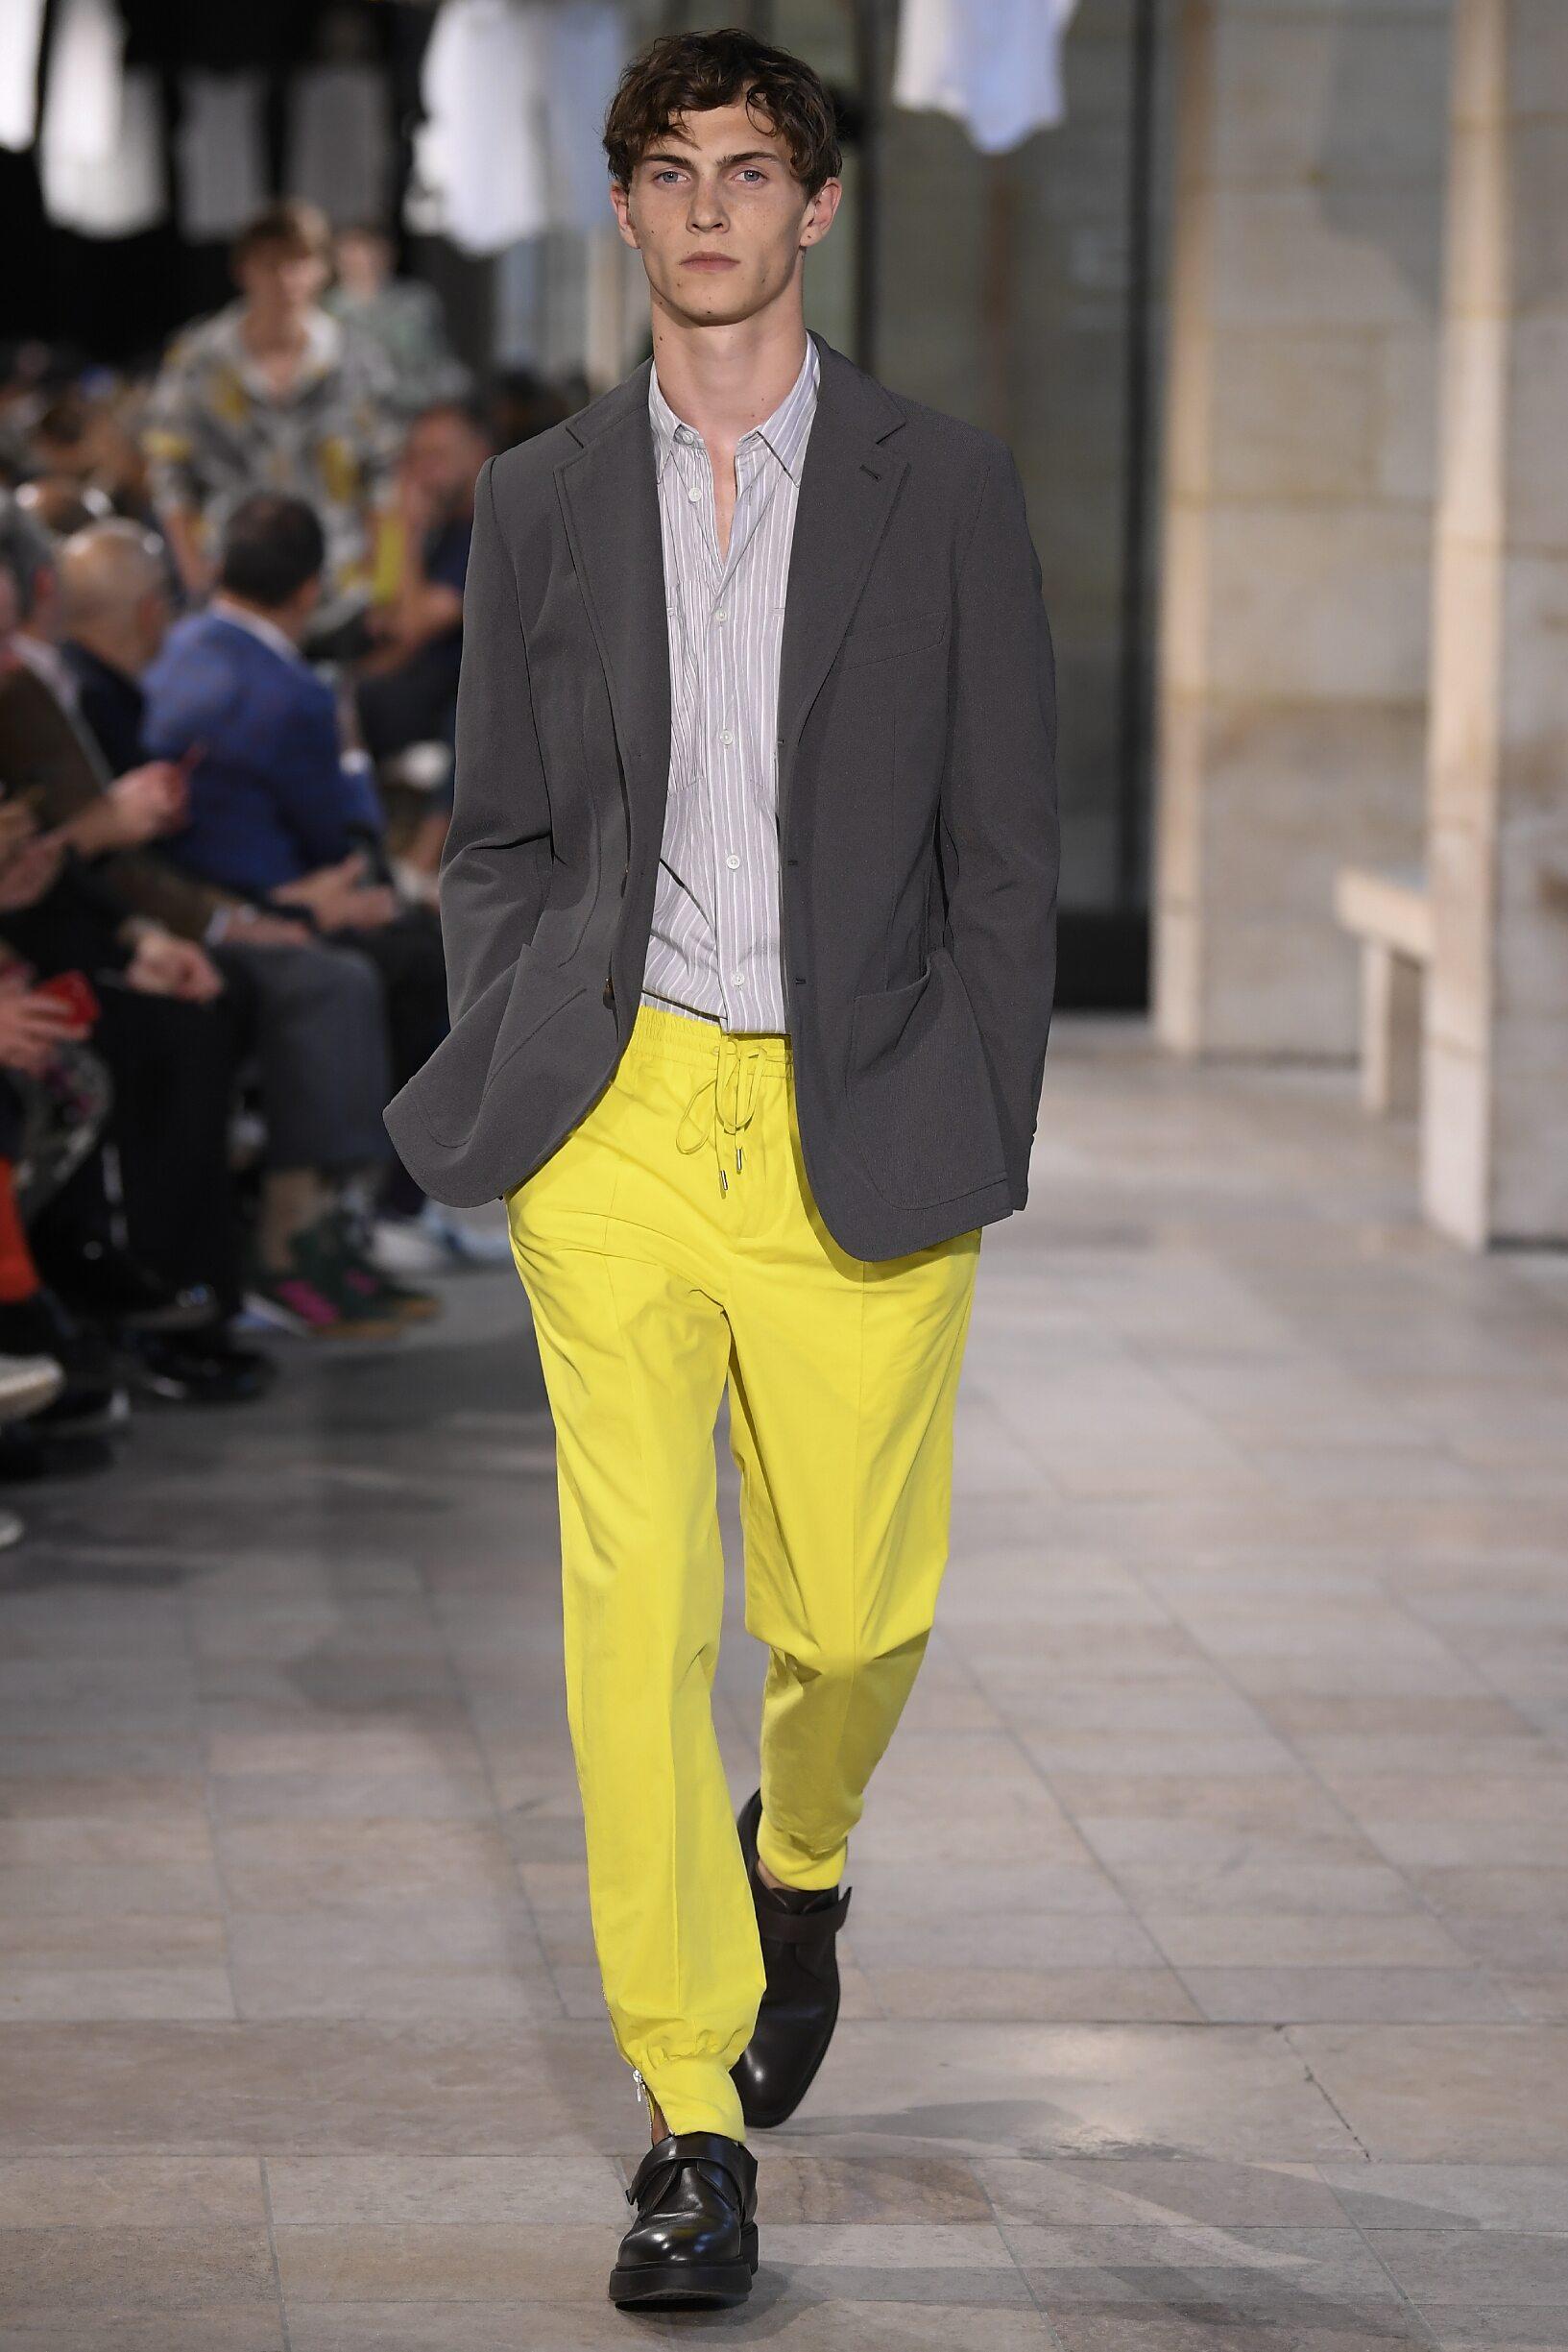 Hermès SS 2019 Menswear